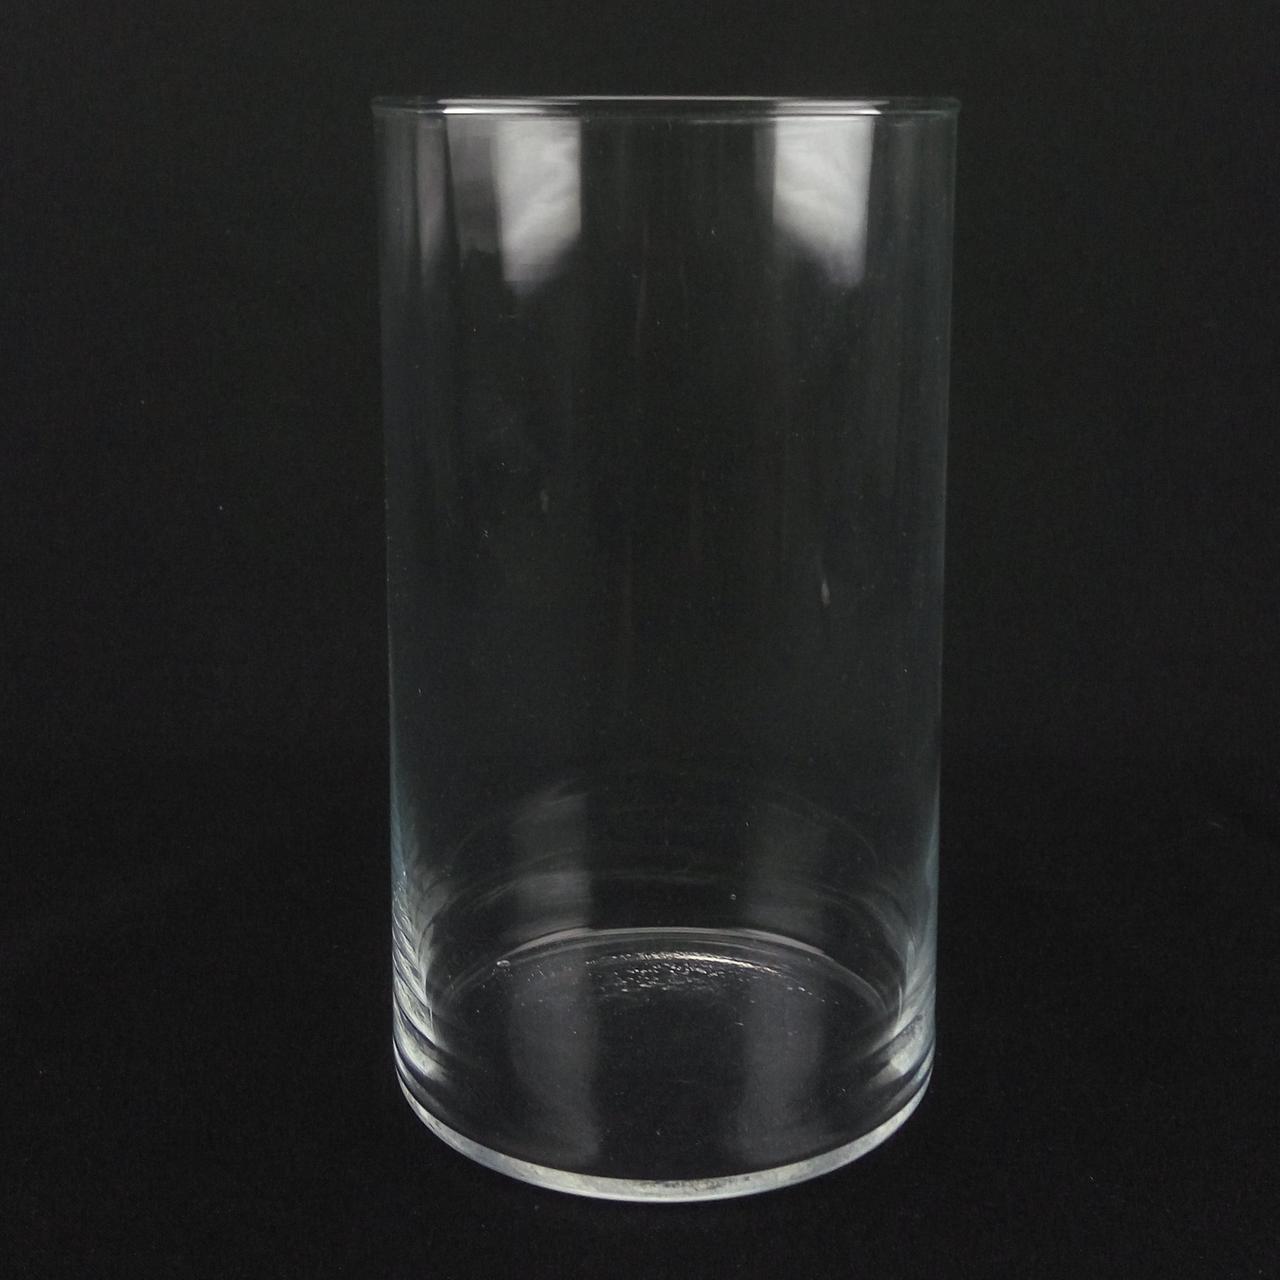 Подсвечник h 20 см, Ø 11 см, колба